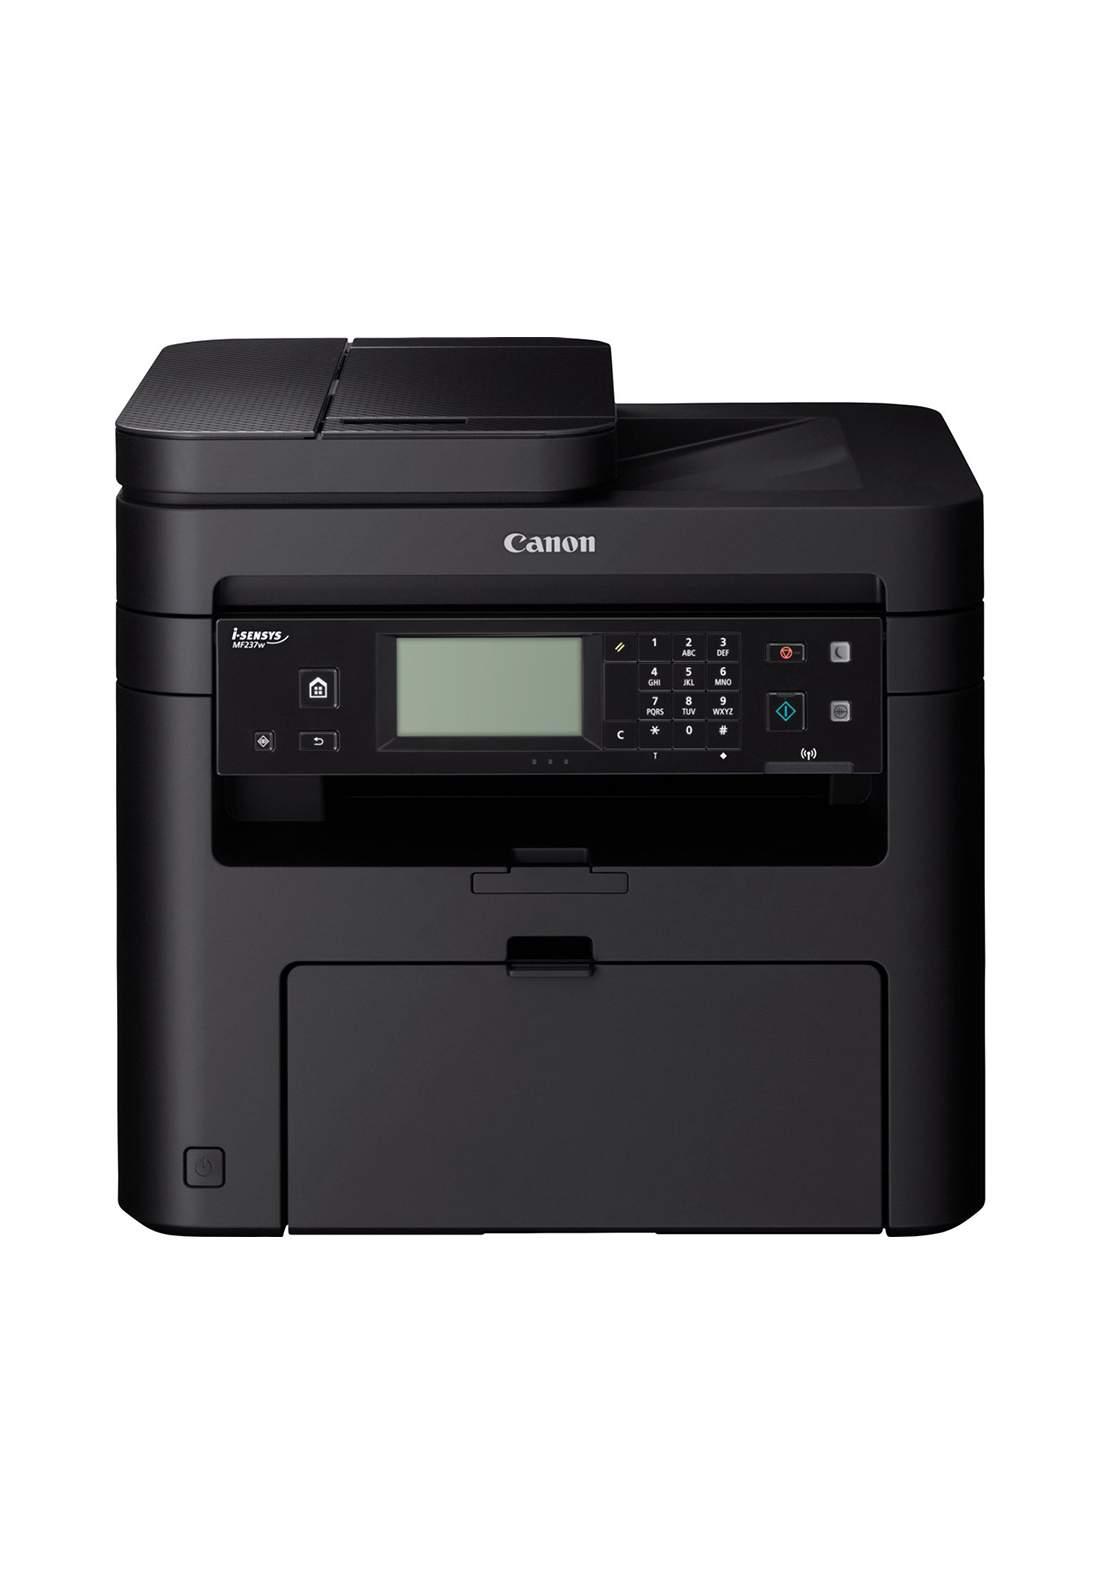 Canon MF237w Mono Laser Printer - Black طابعة